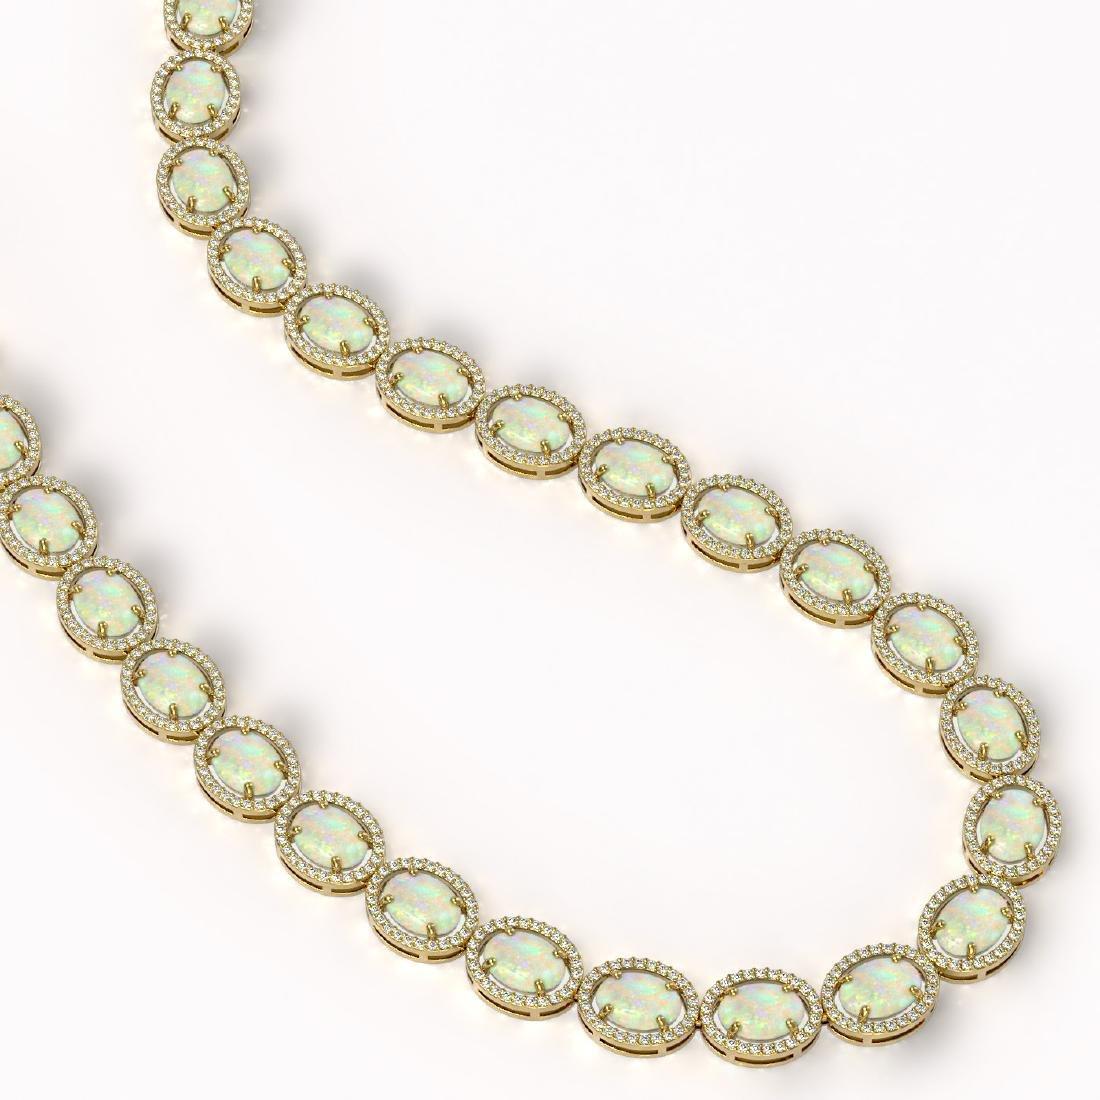 42.29 CTW Opal & Diamond Halo Necklace 10K Yellow Gold - 2